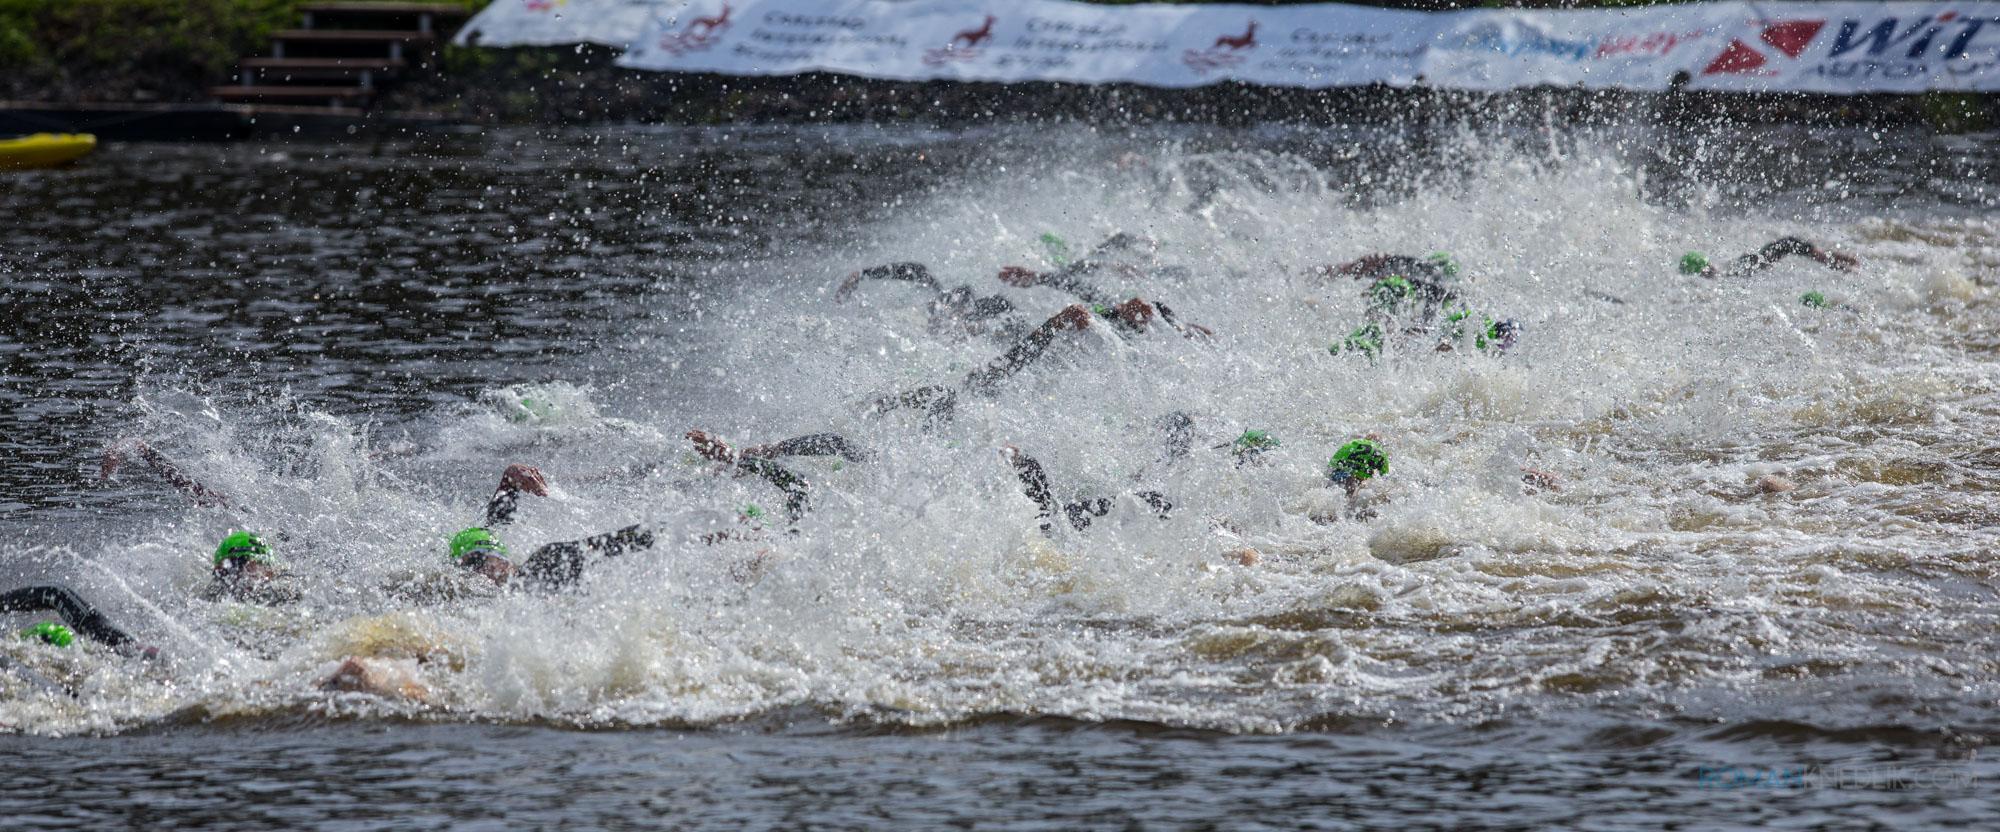 ICU_World_Cup_Triathlon_KV-3